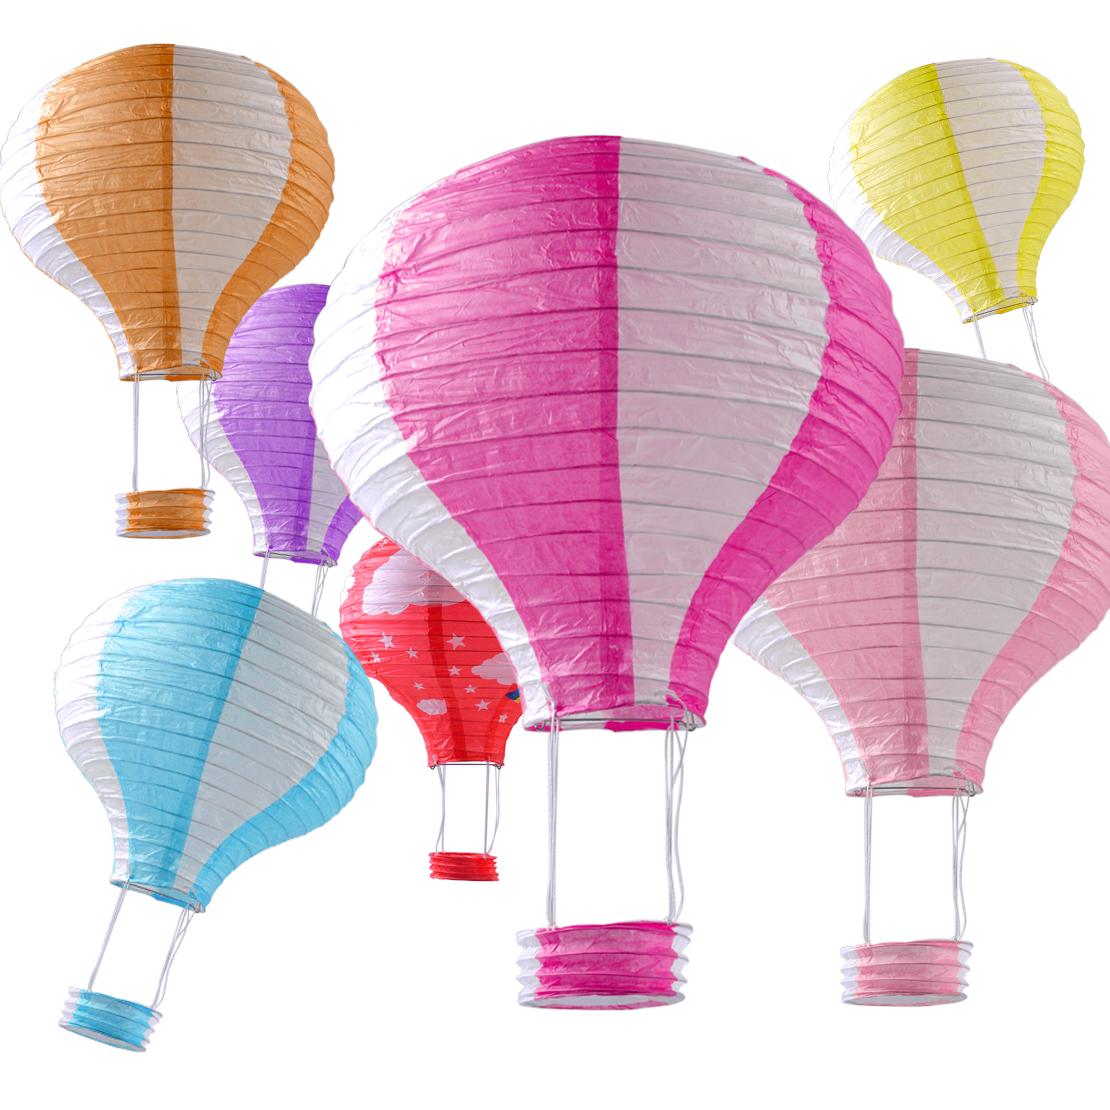 hei luftballon papierlaterne lampion party hochzeit hot. Black Bedroom Furniture Sets. Home Design Ideas